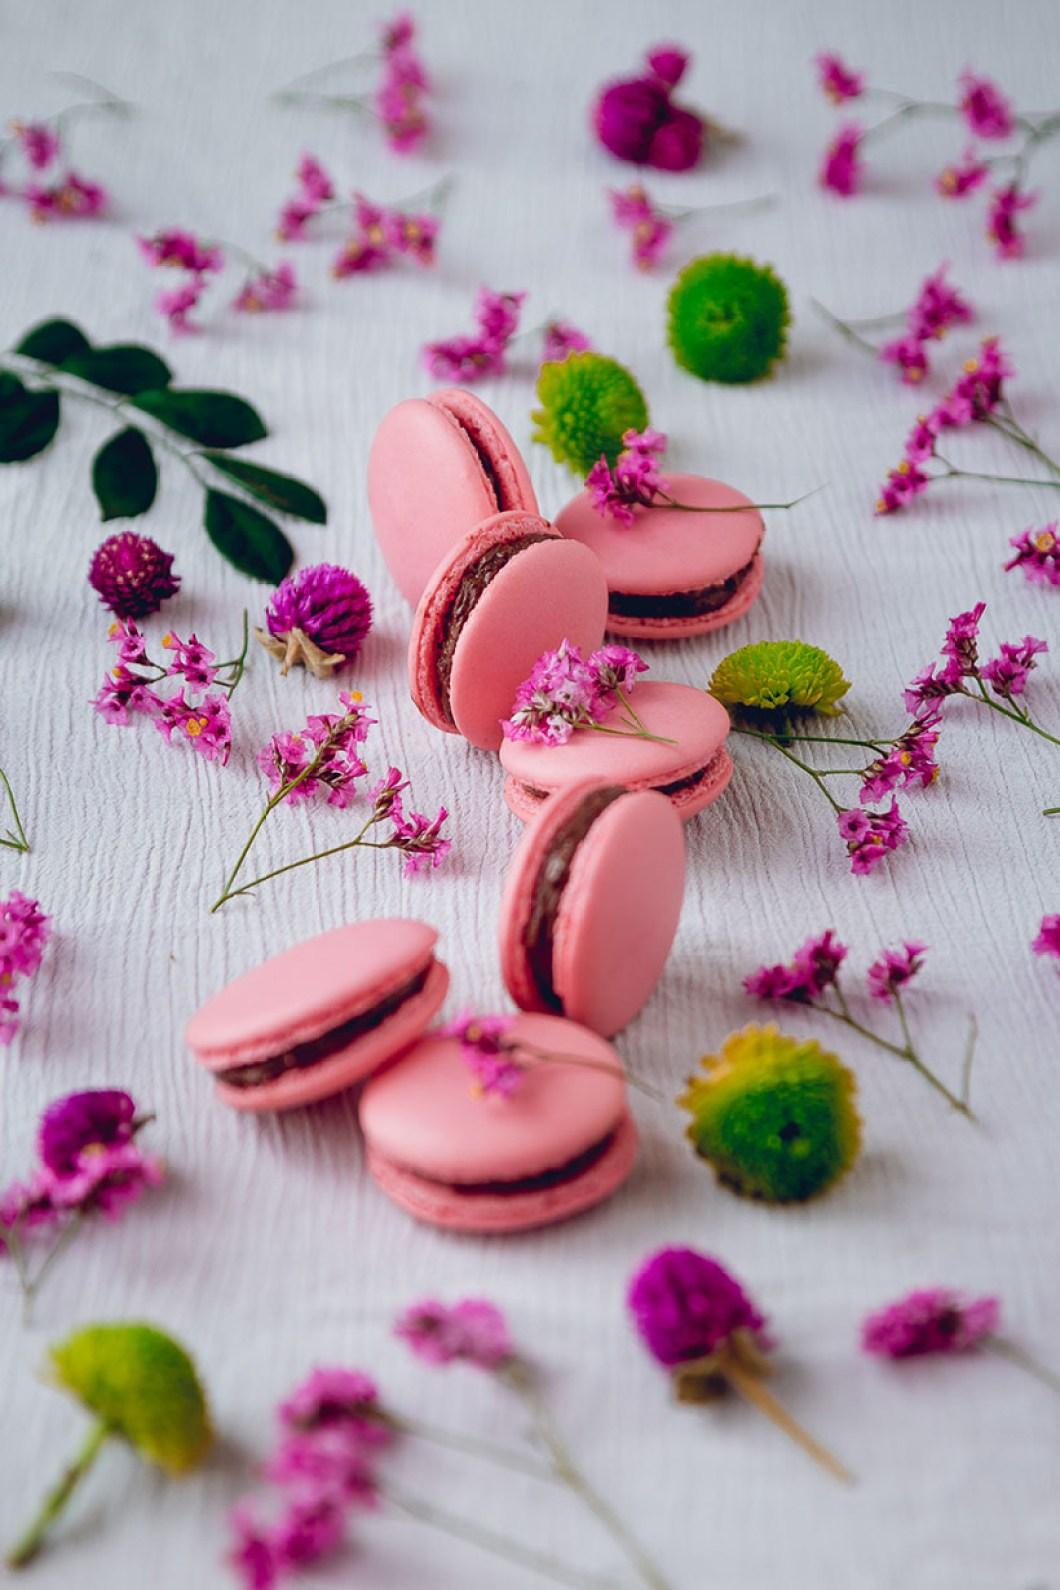 choco_rose_macarons-6424